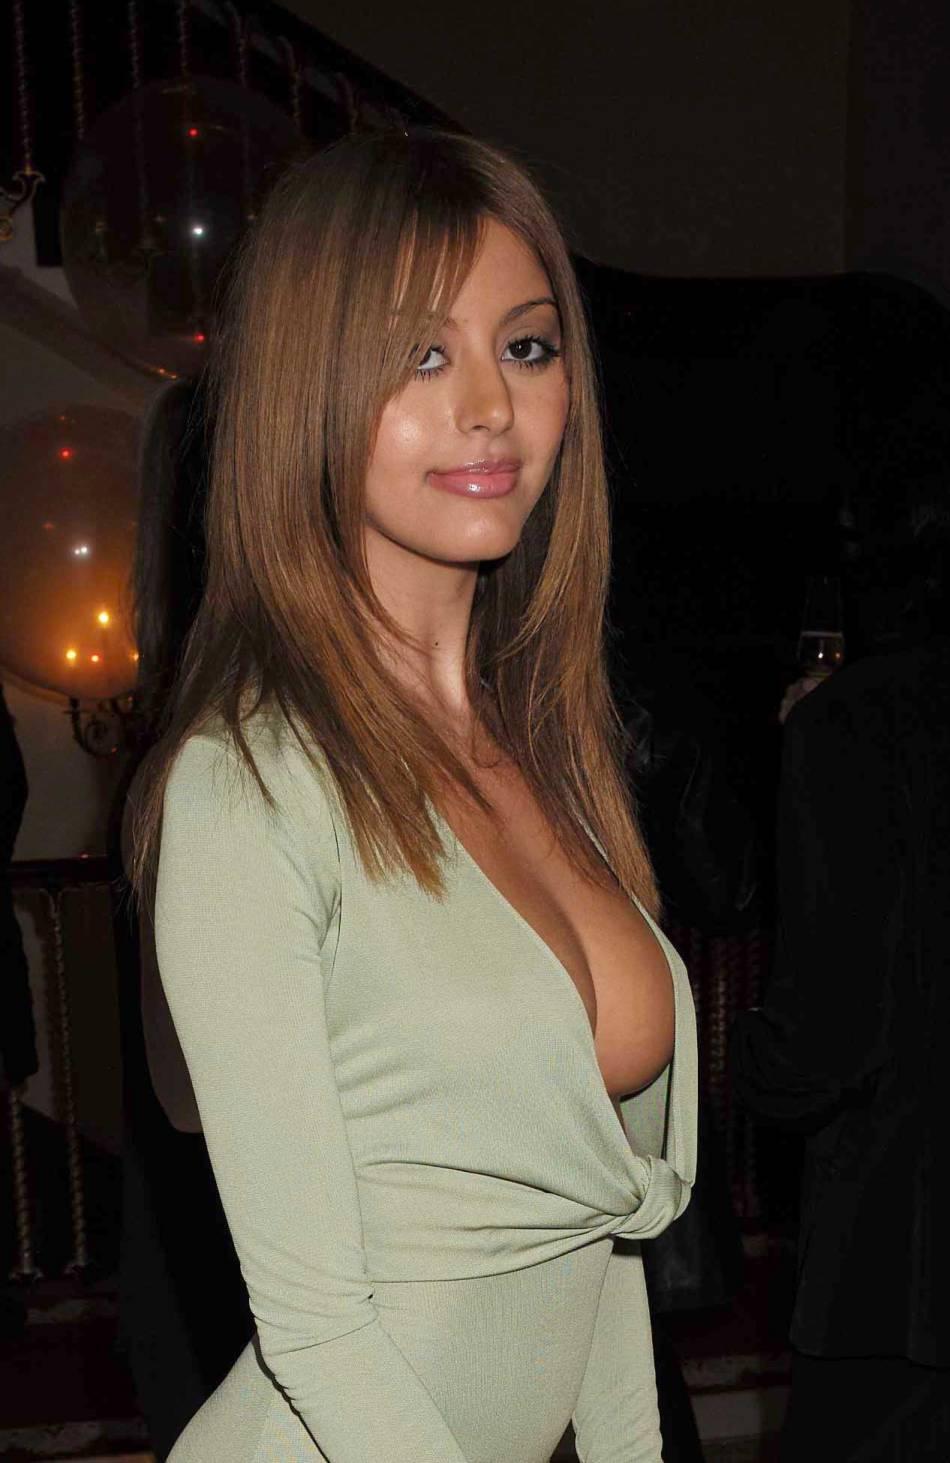 gros seins nus escort girl a valence